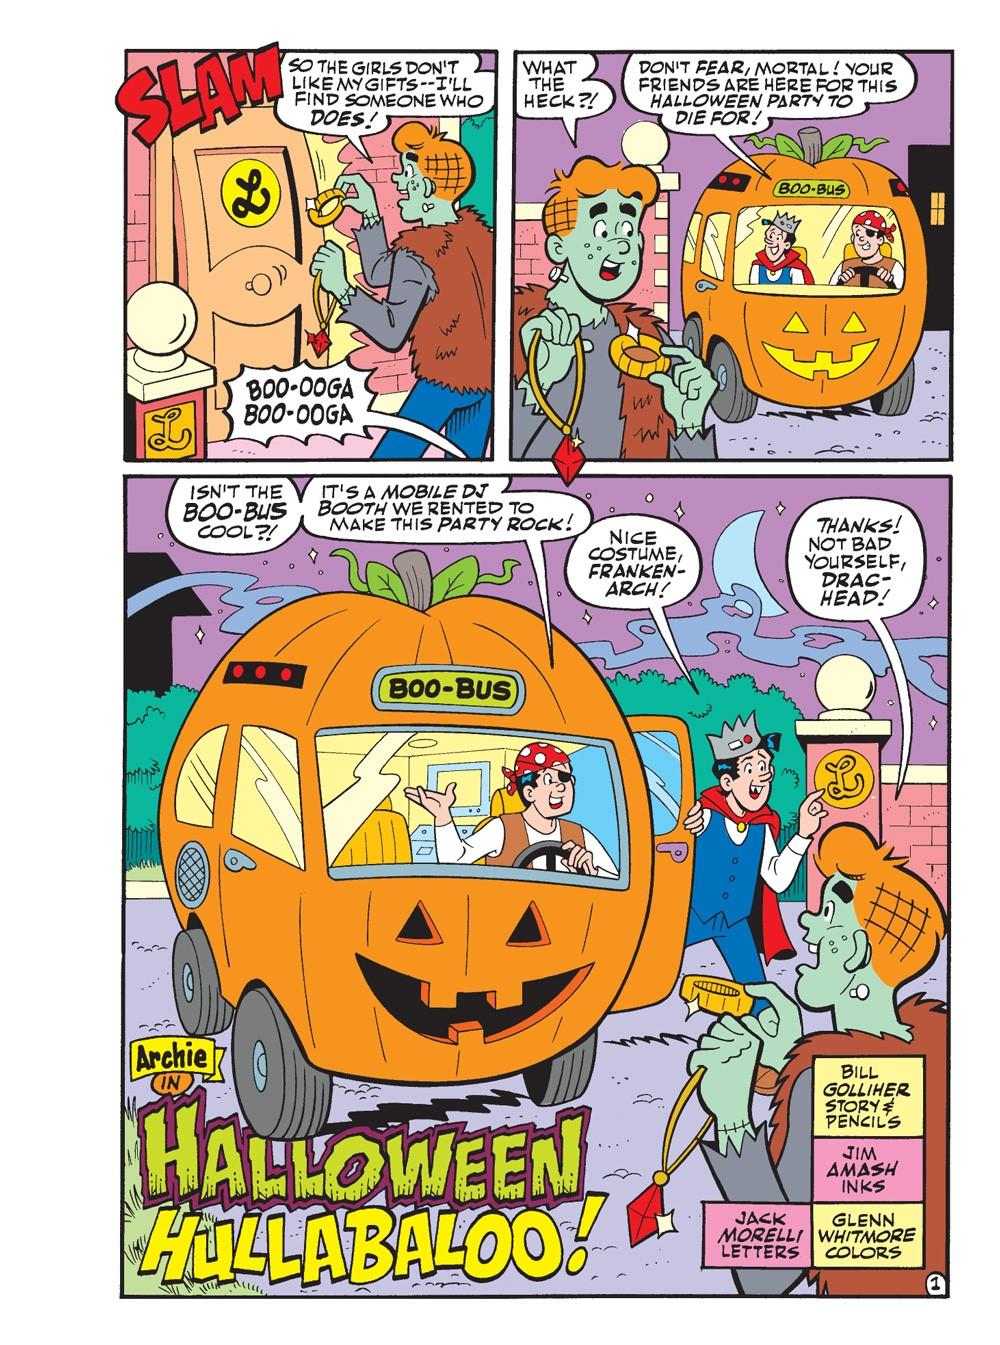 WorldOfArchieJumboComicsDigest_113-2 ComicList Previews: WORLD OF ARCHIE JUMBO COMICS DIGEST #113